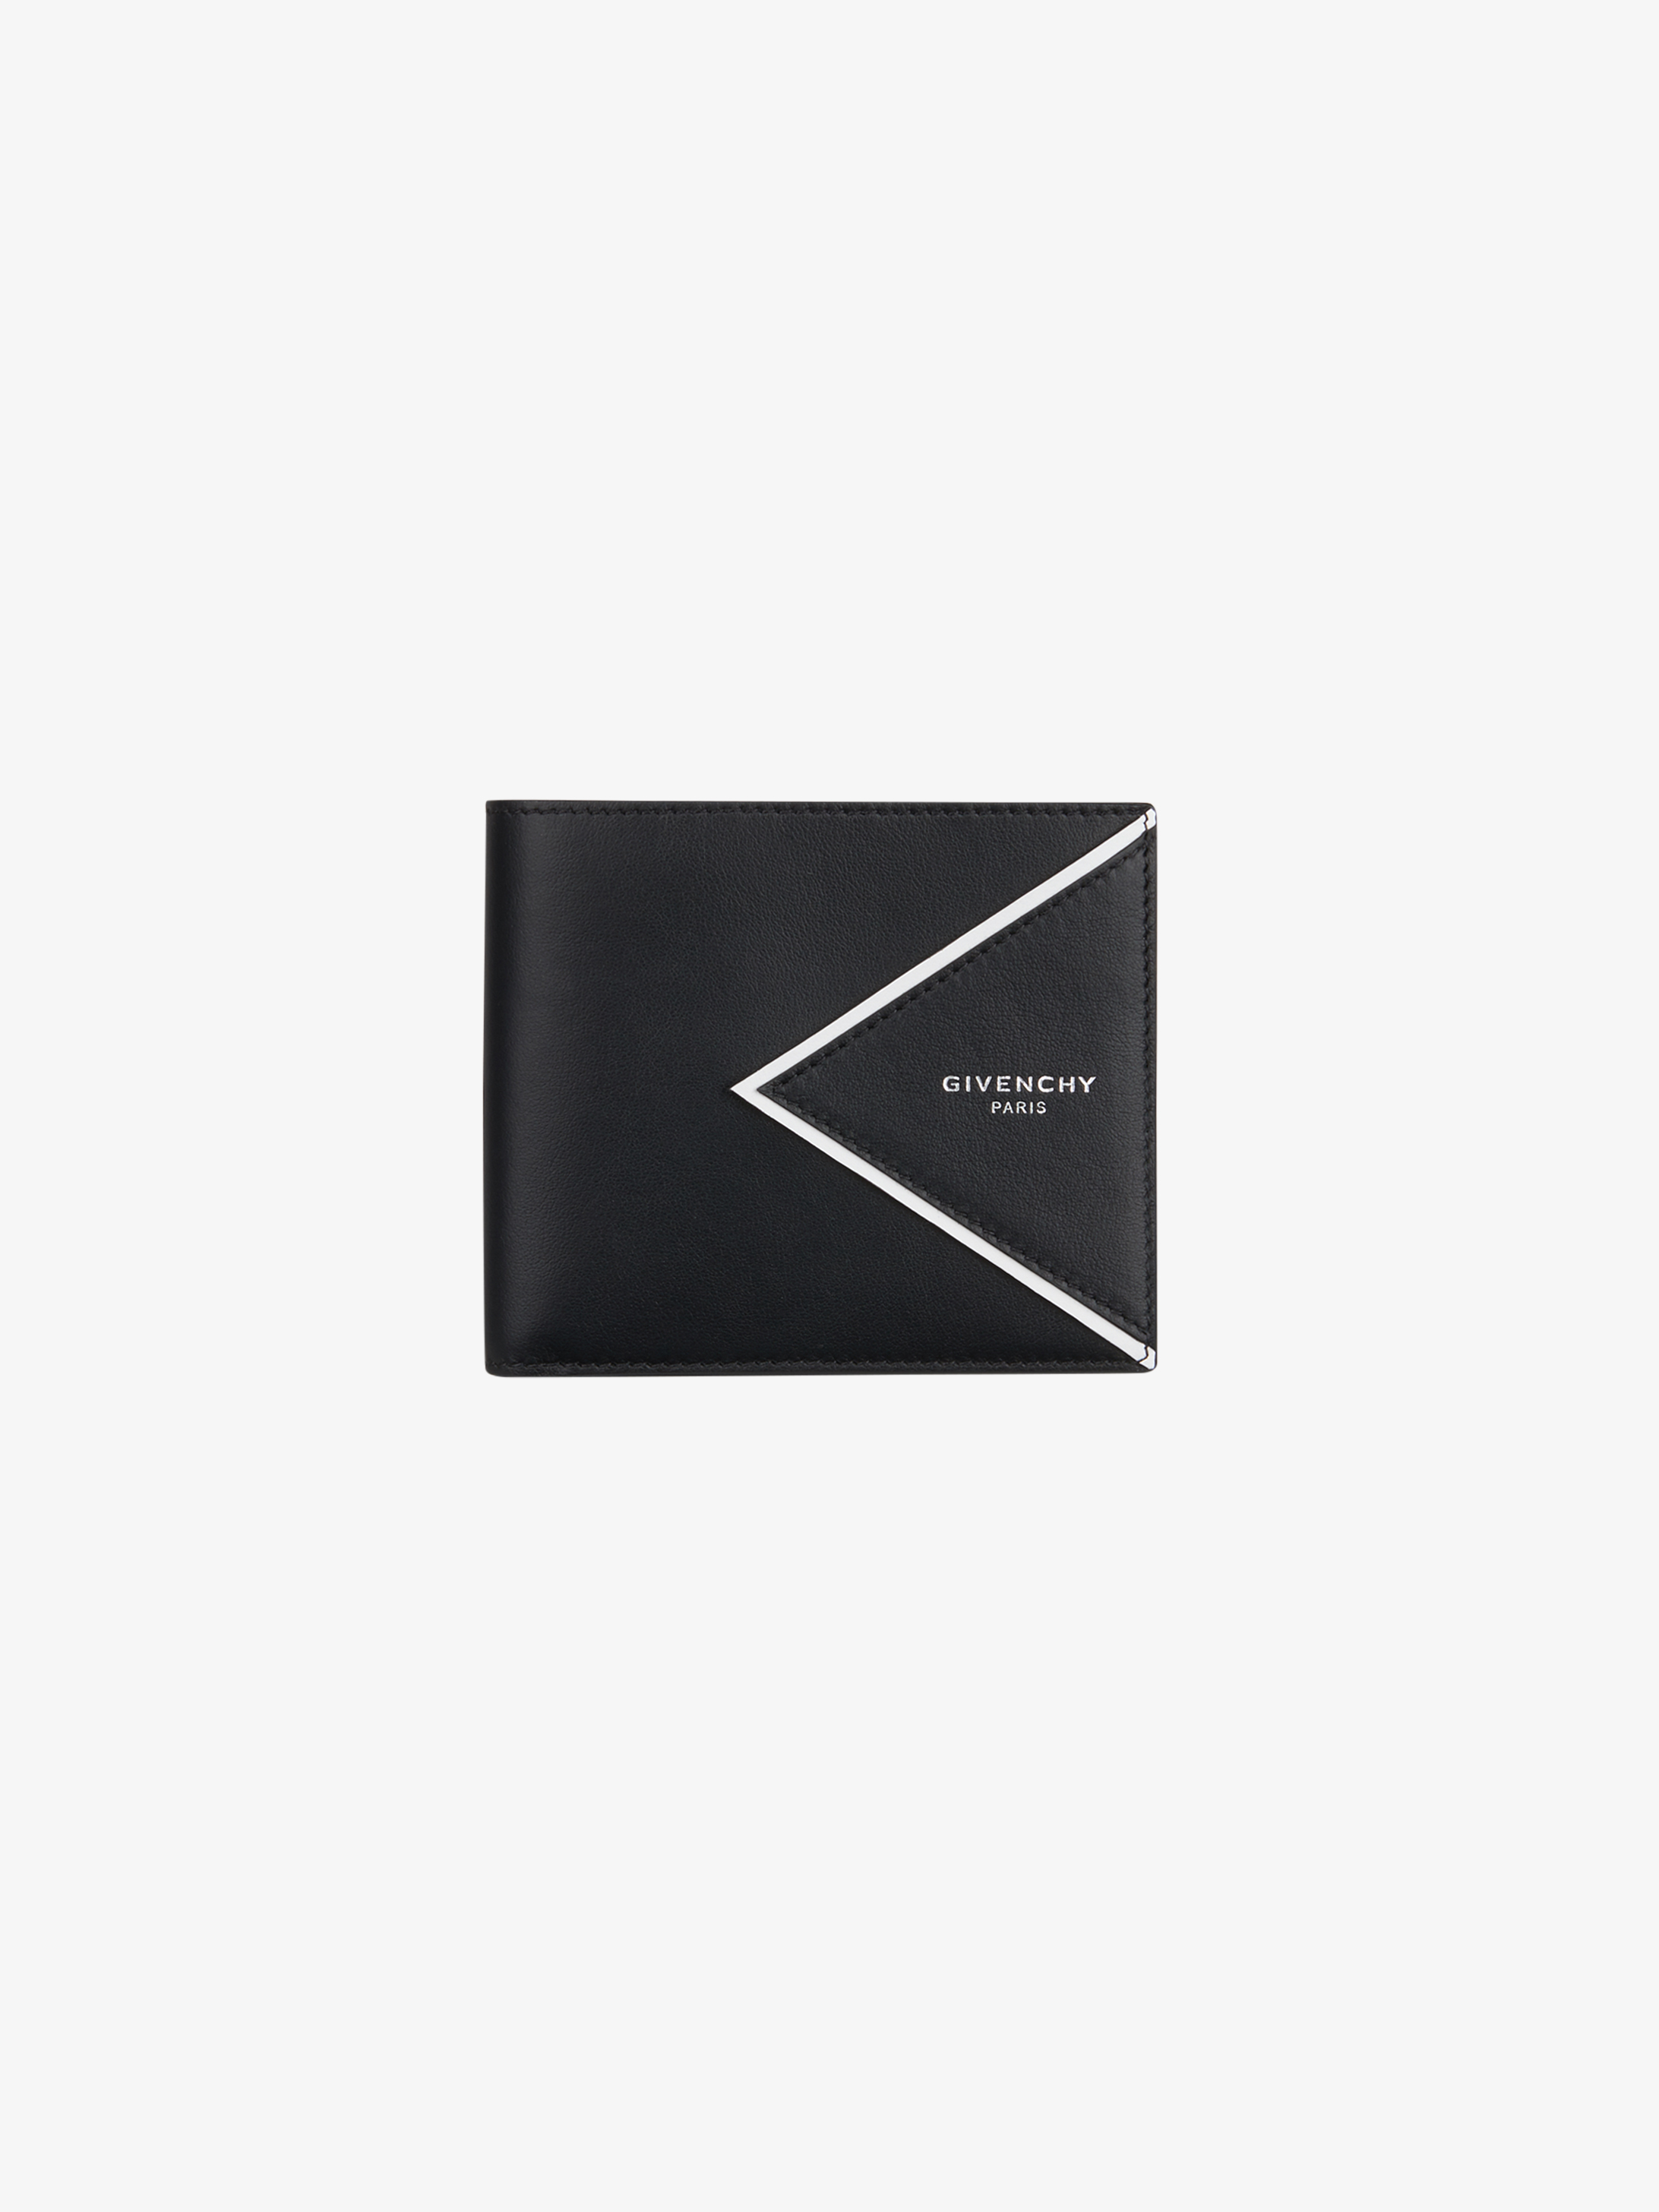 V shape cut wallet in leather